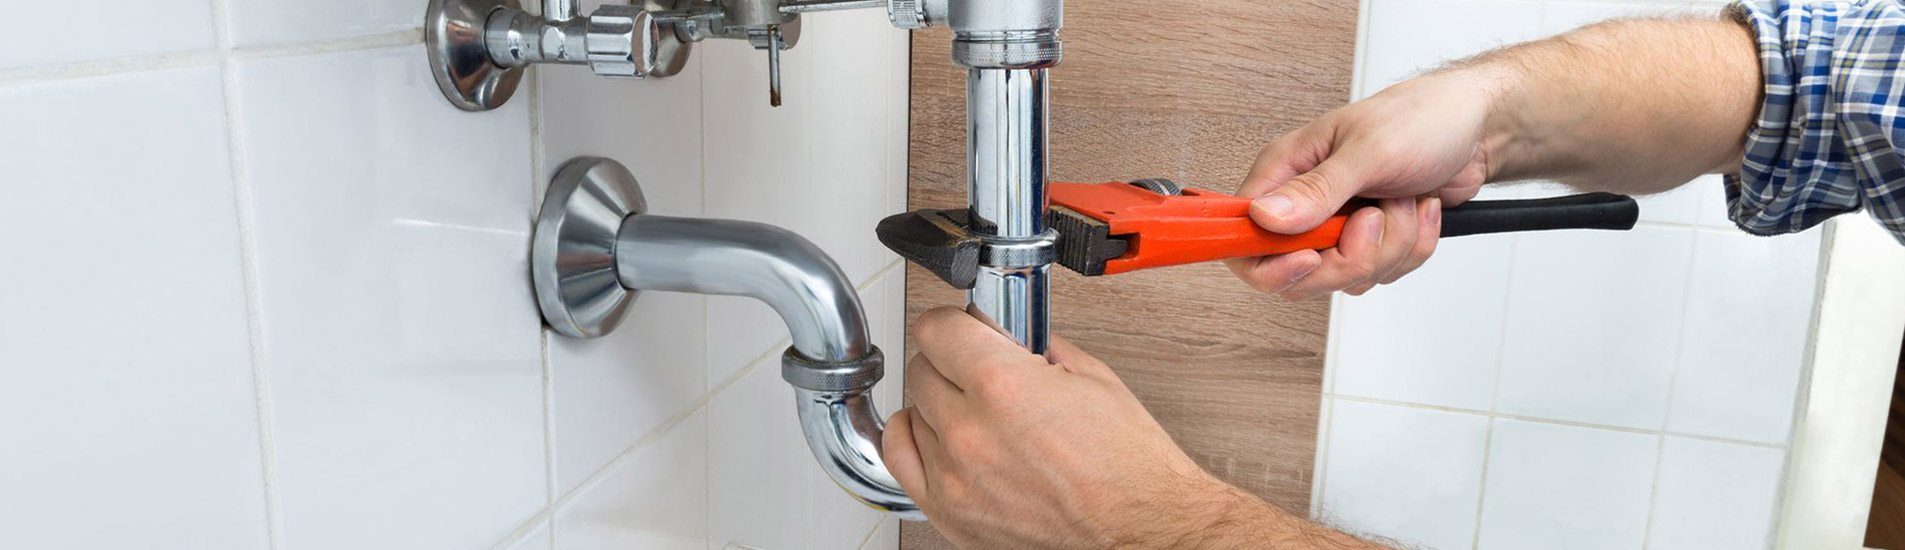 Comercializare, montaj instalatii sanitare Brasov